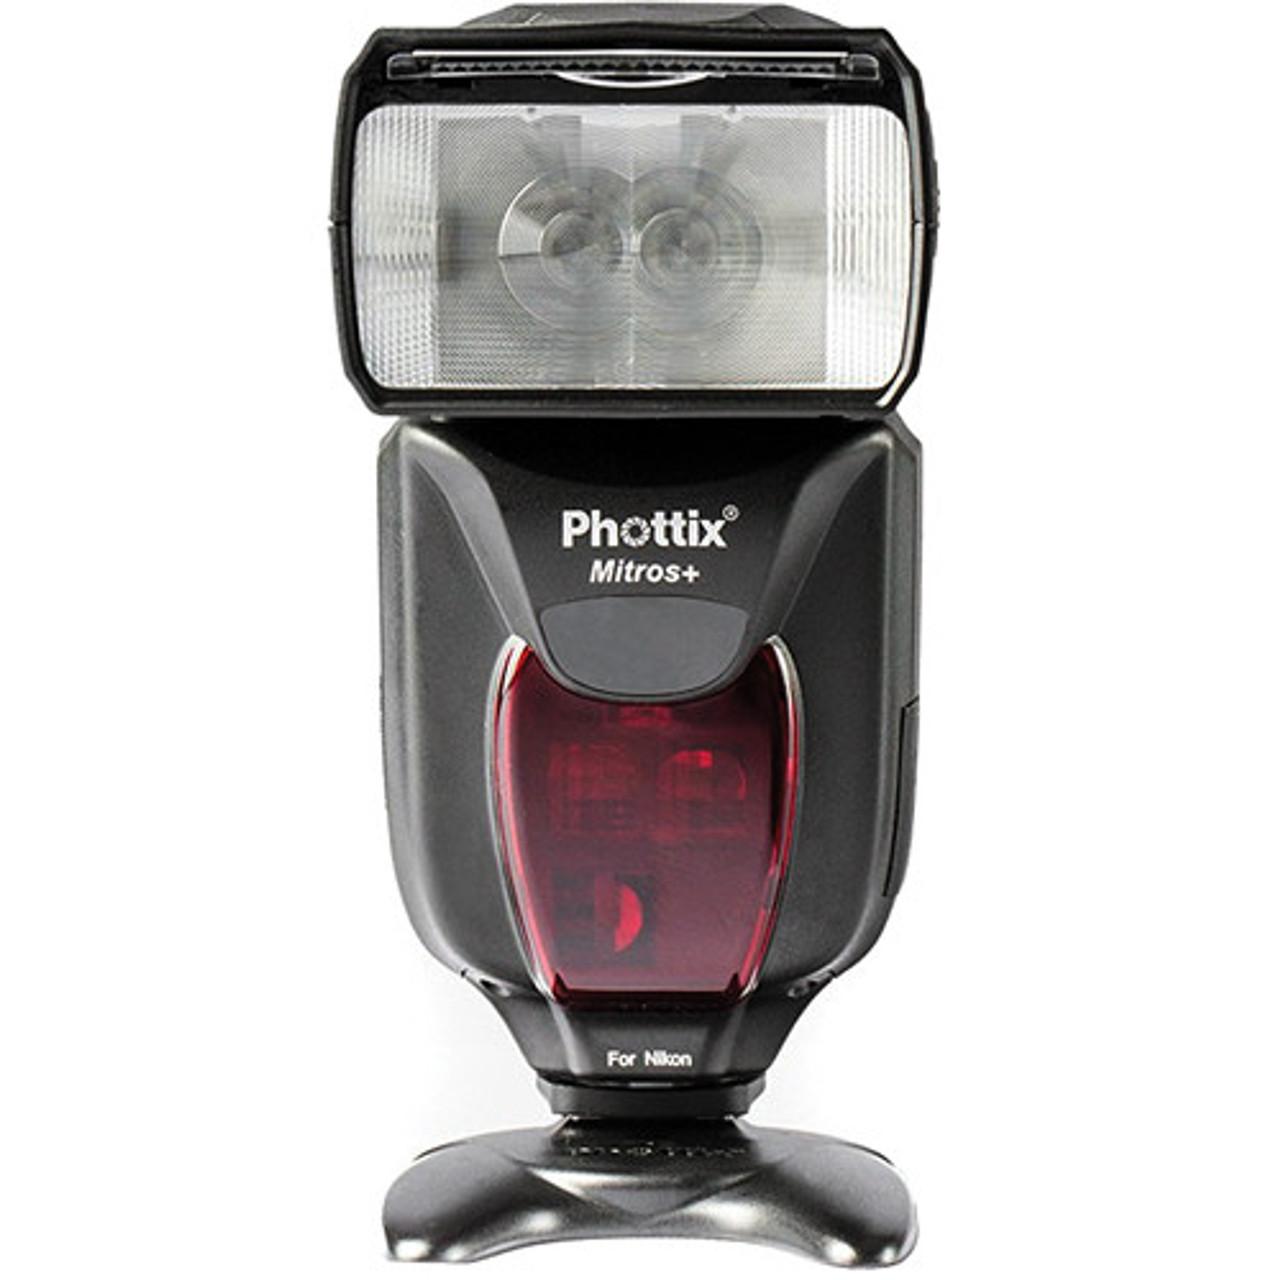 Phottix Mitros+ TTL Tranceiver Flash for Nikon